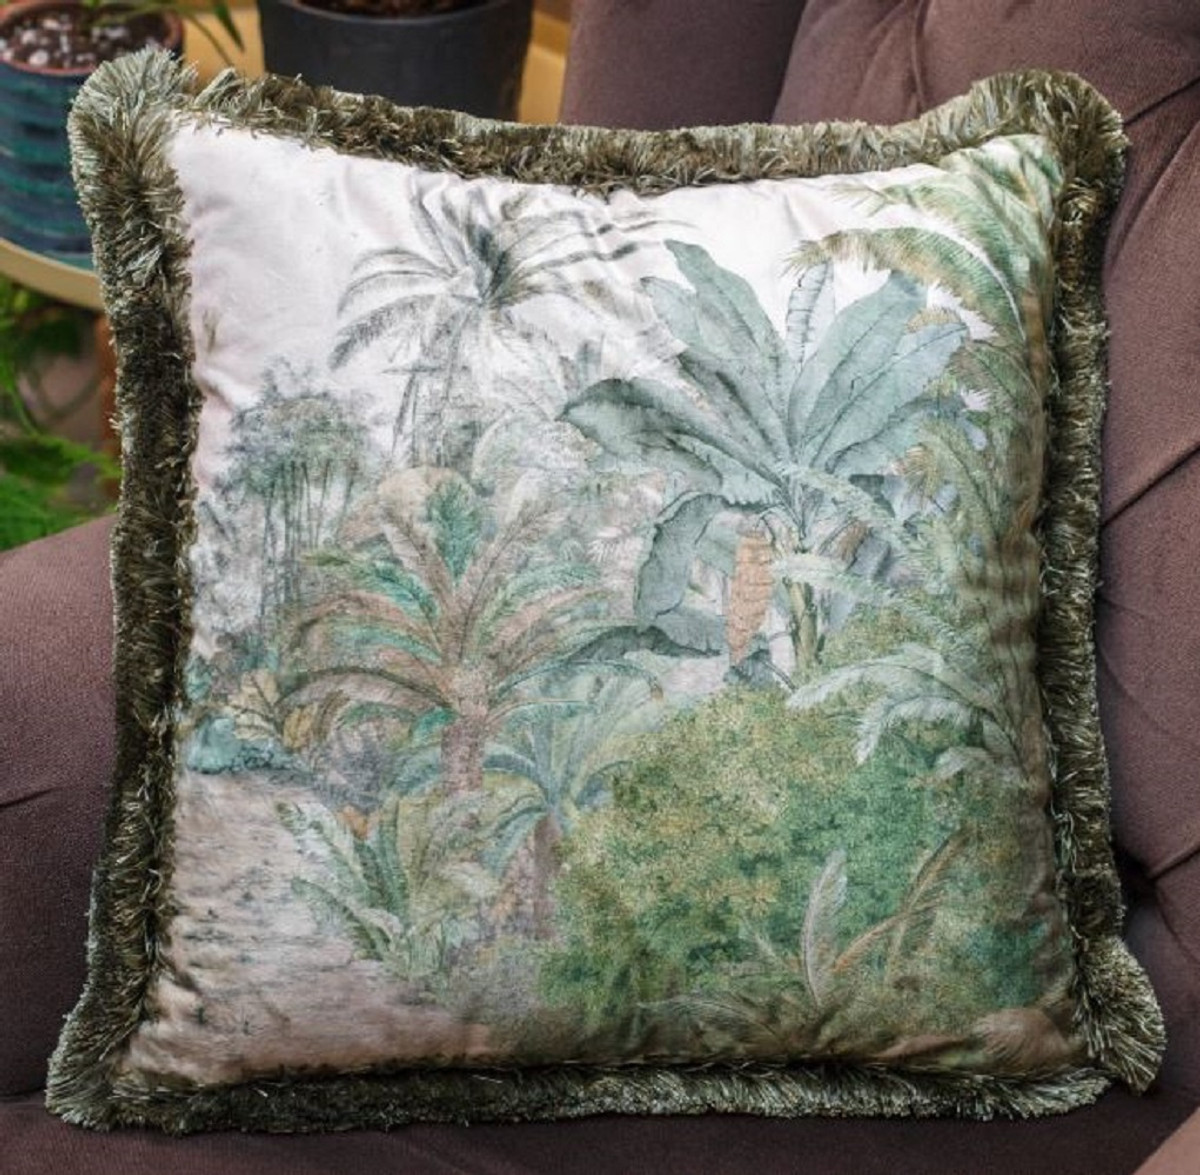 casa padrino luxury decorative pillow palm trees landscape cream green 45 x 45 cm printed velvet pillow with fringes living room decoration